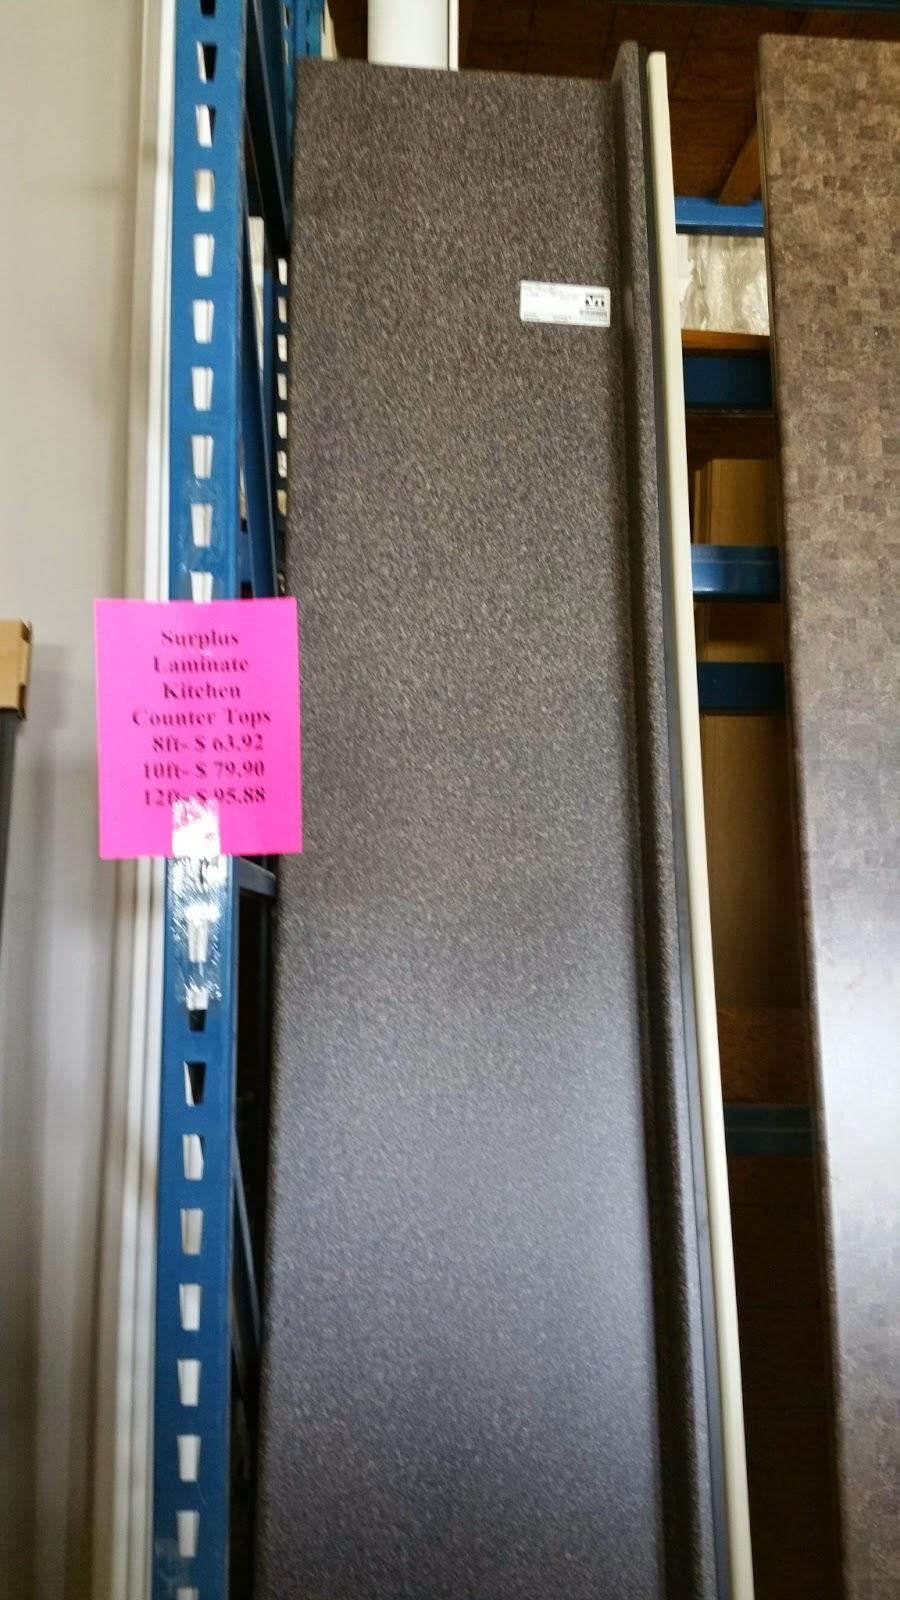 Surplus Guys - store  | Photo 5 of 8 | Address: 4811 US-82, Gainesville, TX 76240, USA | Phone: (940) 665-7771